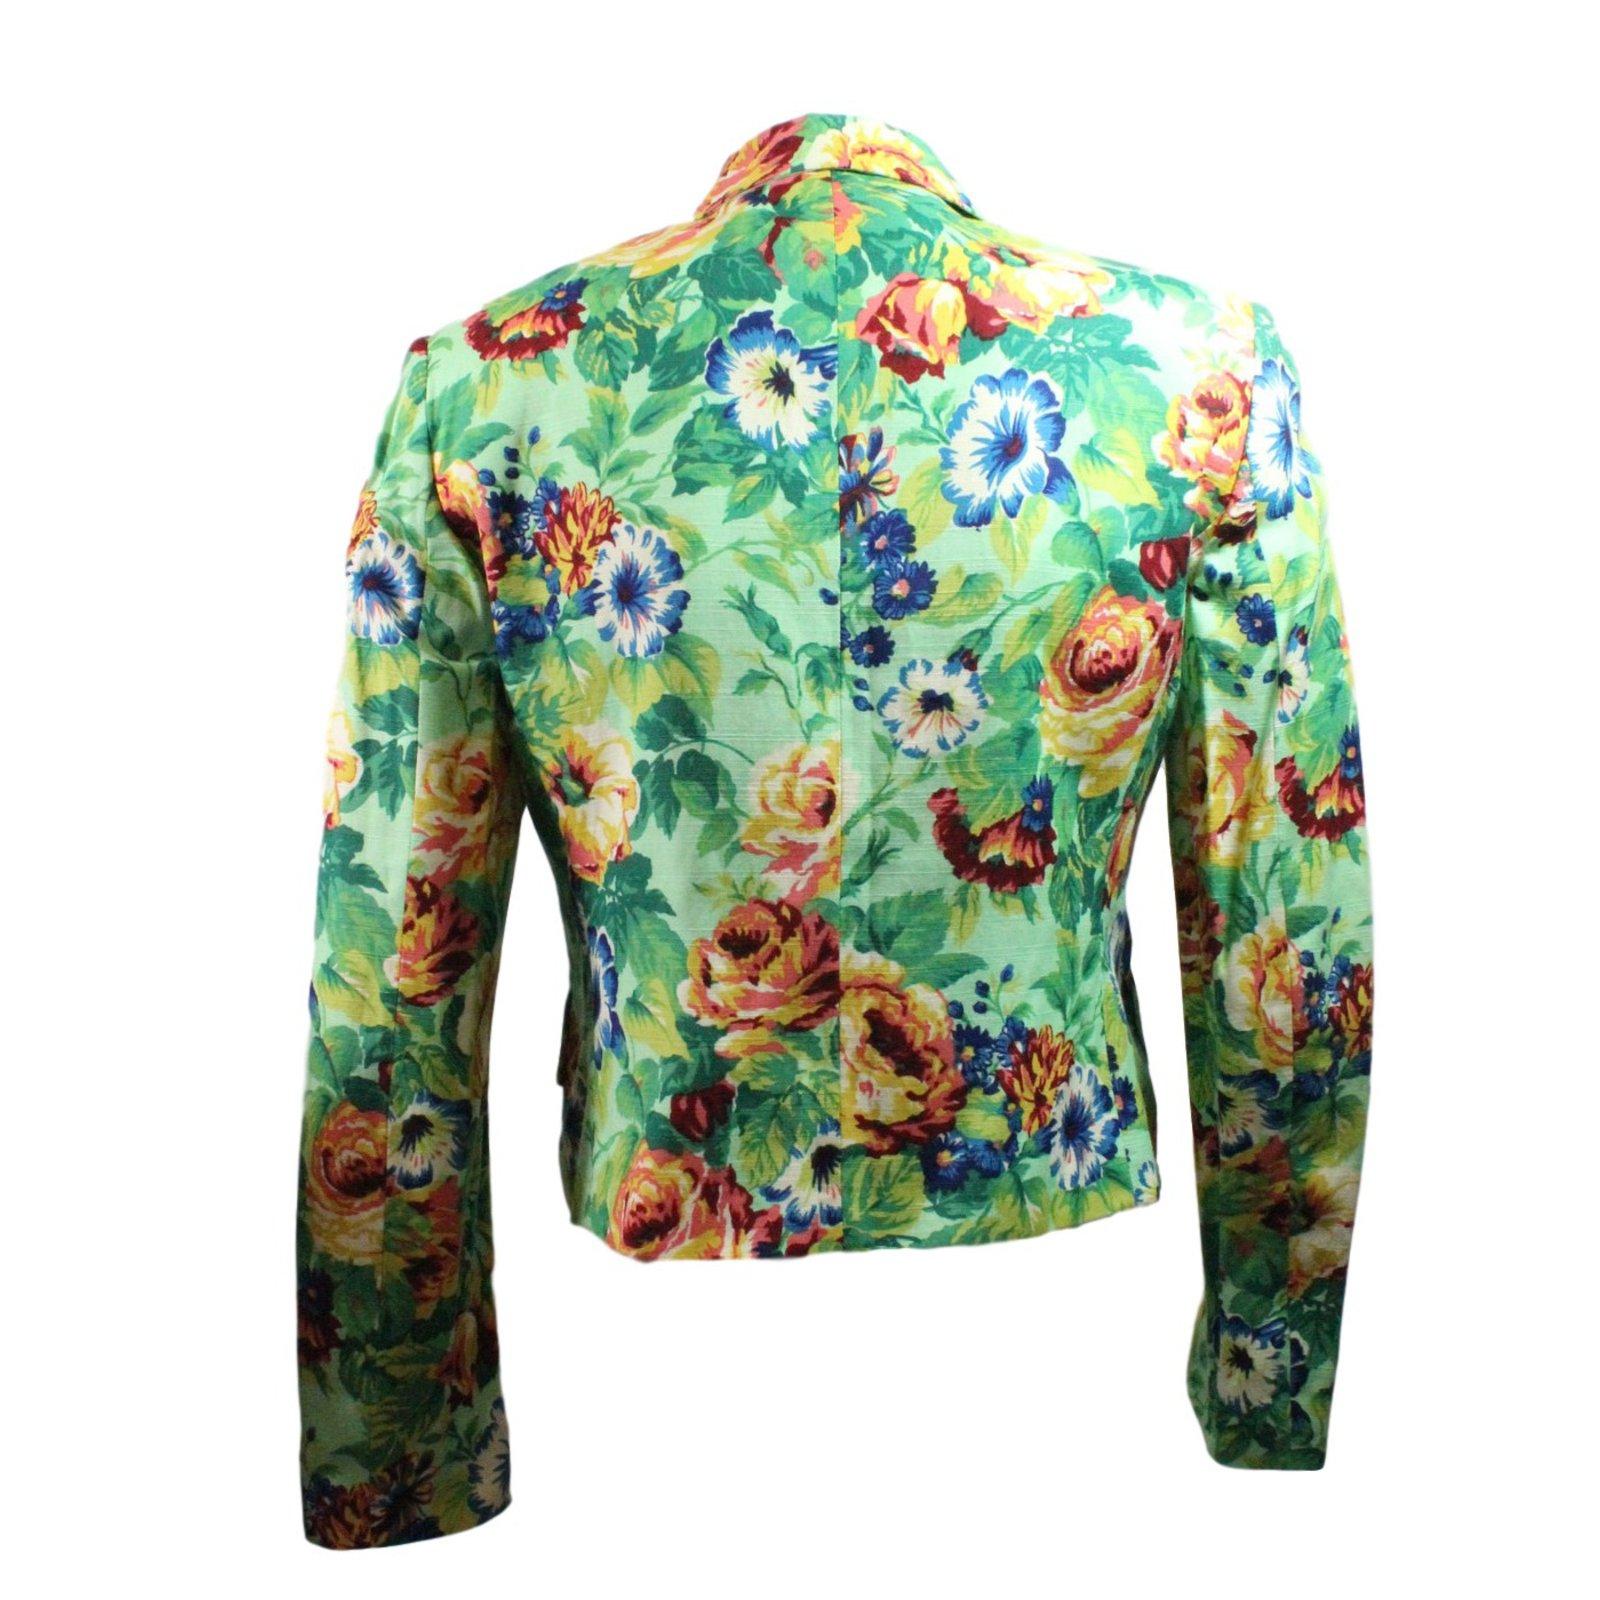 vestes kenzo veste floral viscose lin multicolore joli closet. Black Bedroom Furniture Sets. Home Design Ideas